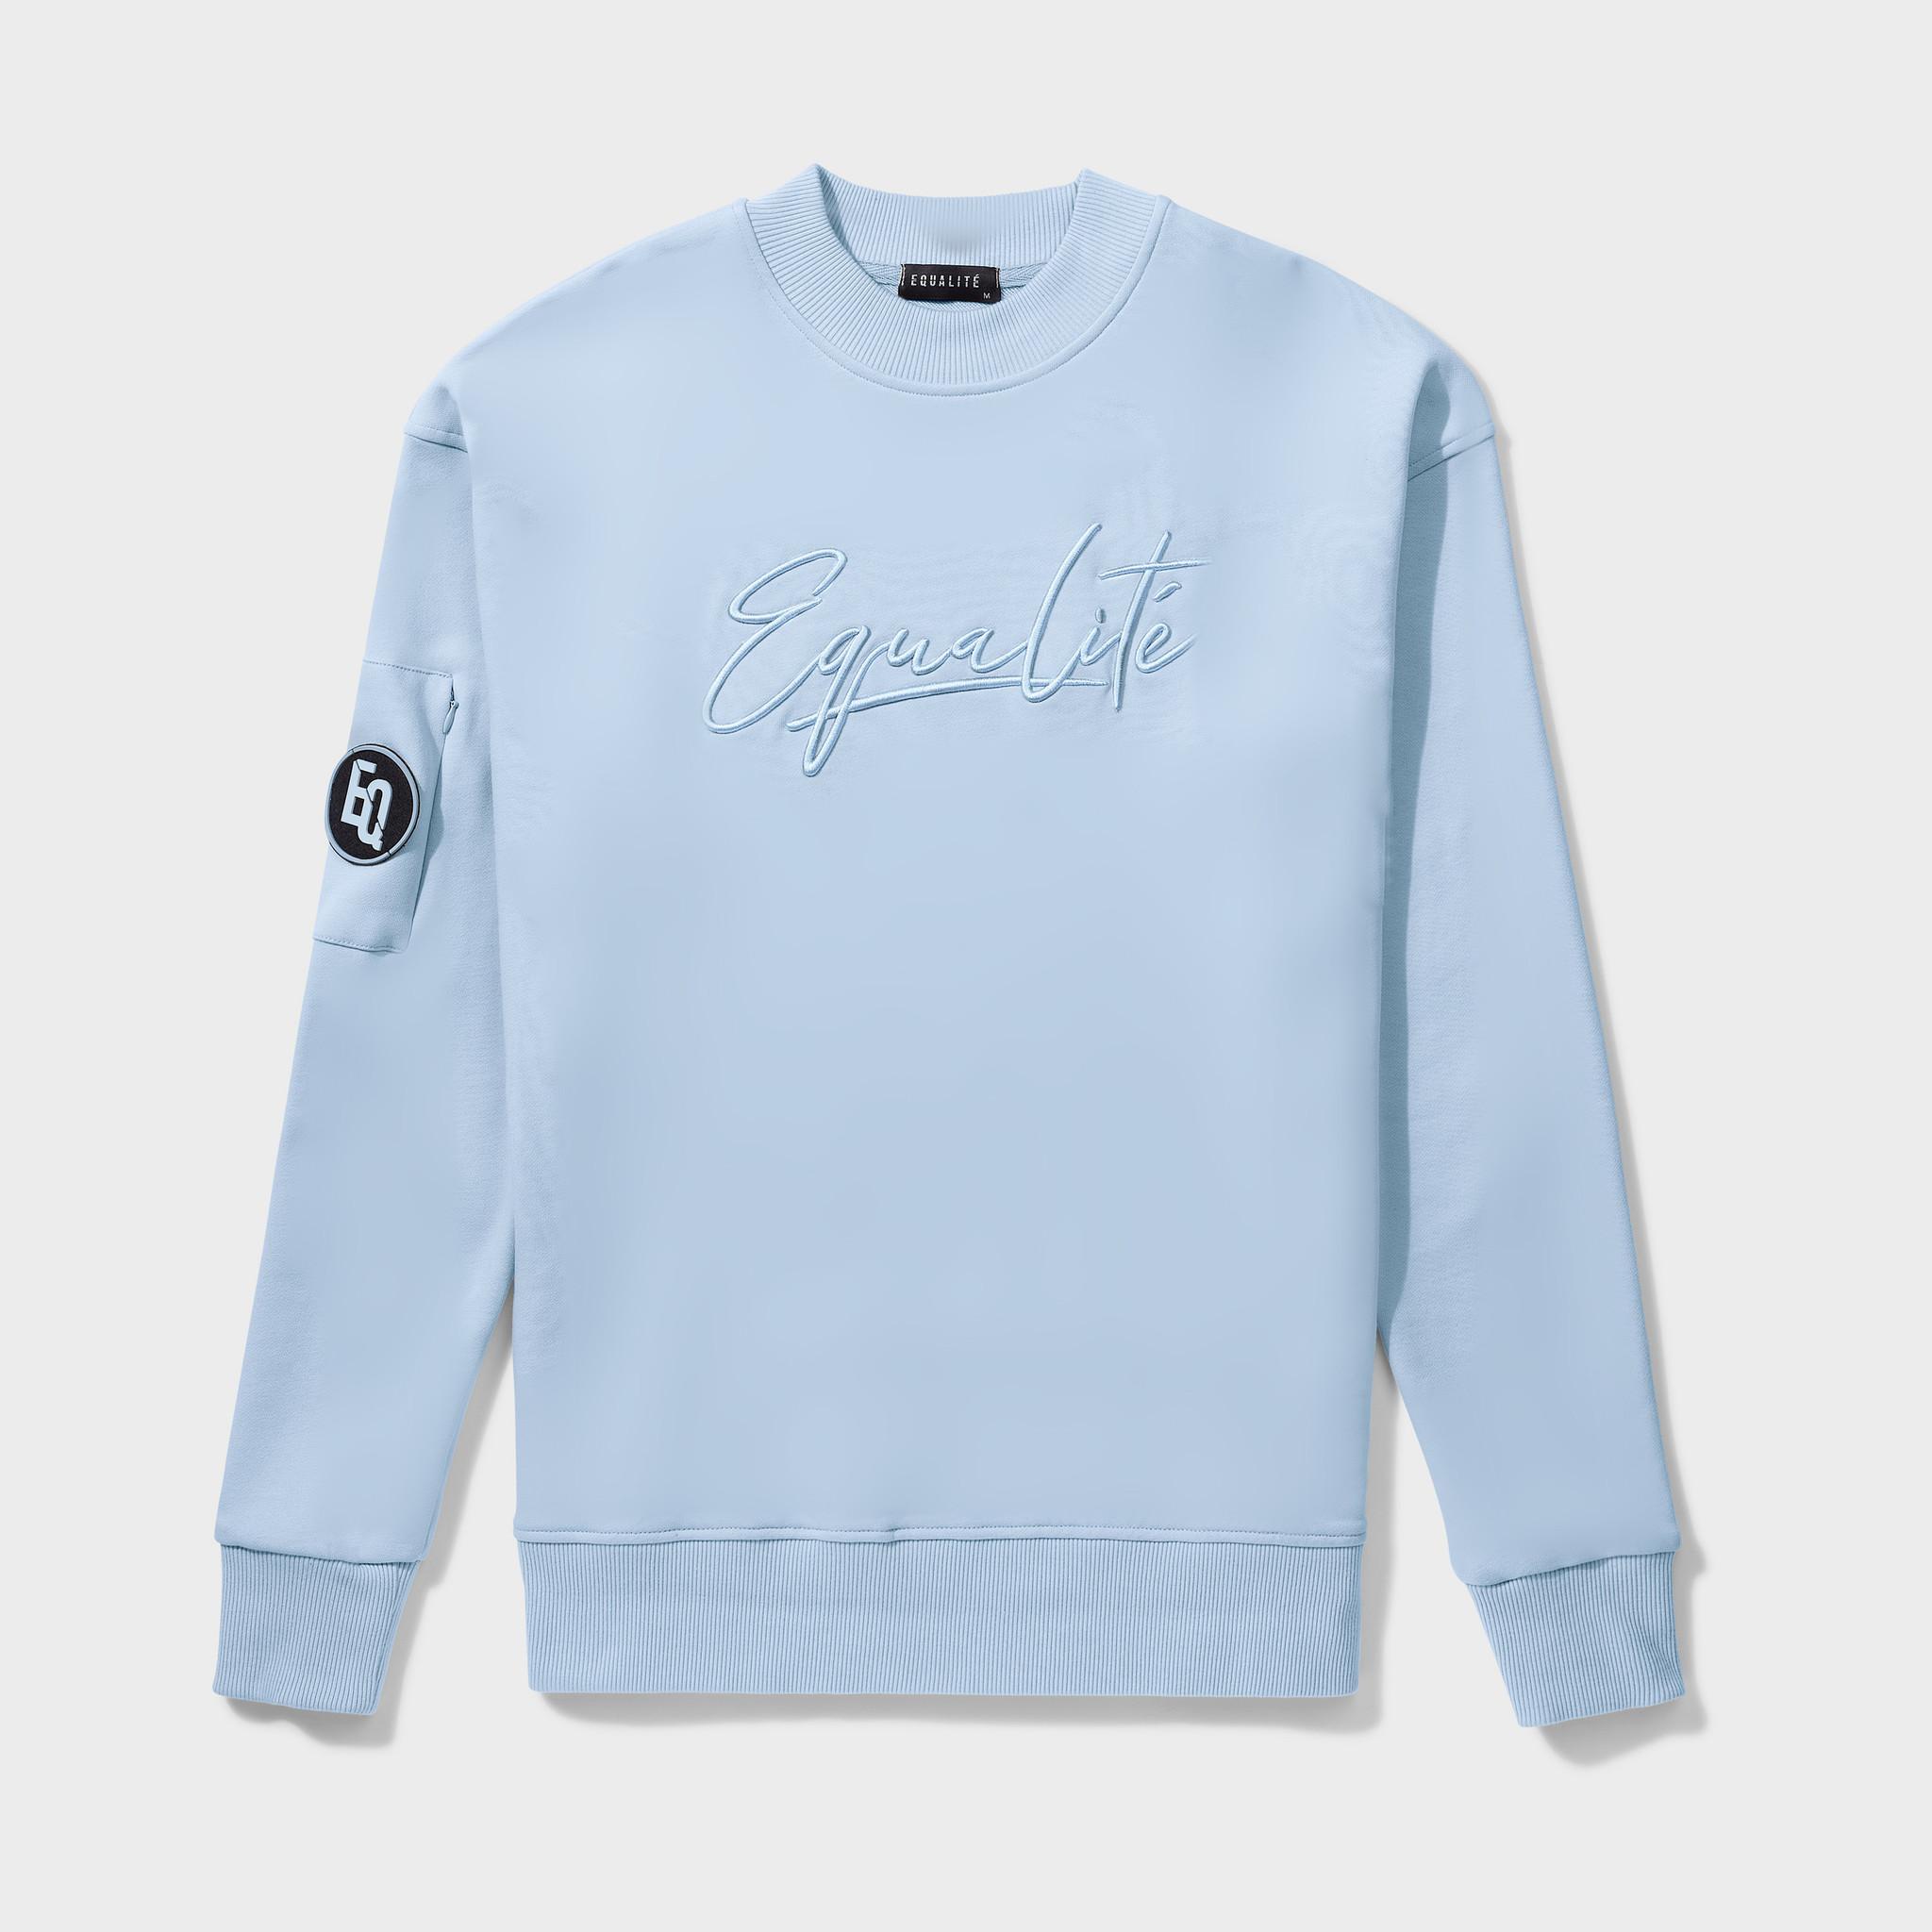 Wafi Signature Sweater Light Blue-1